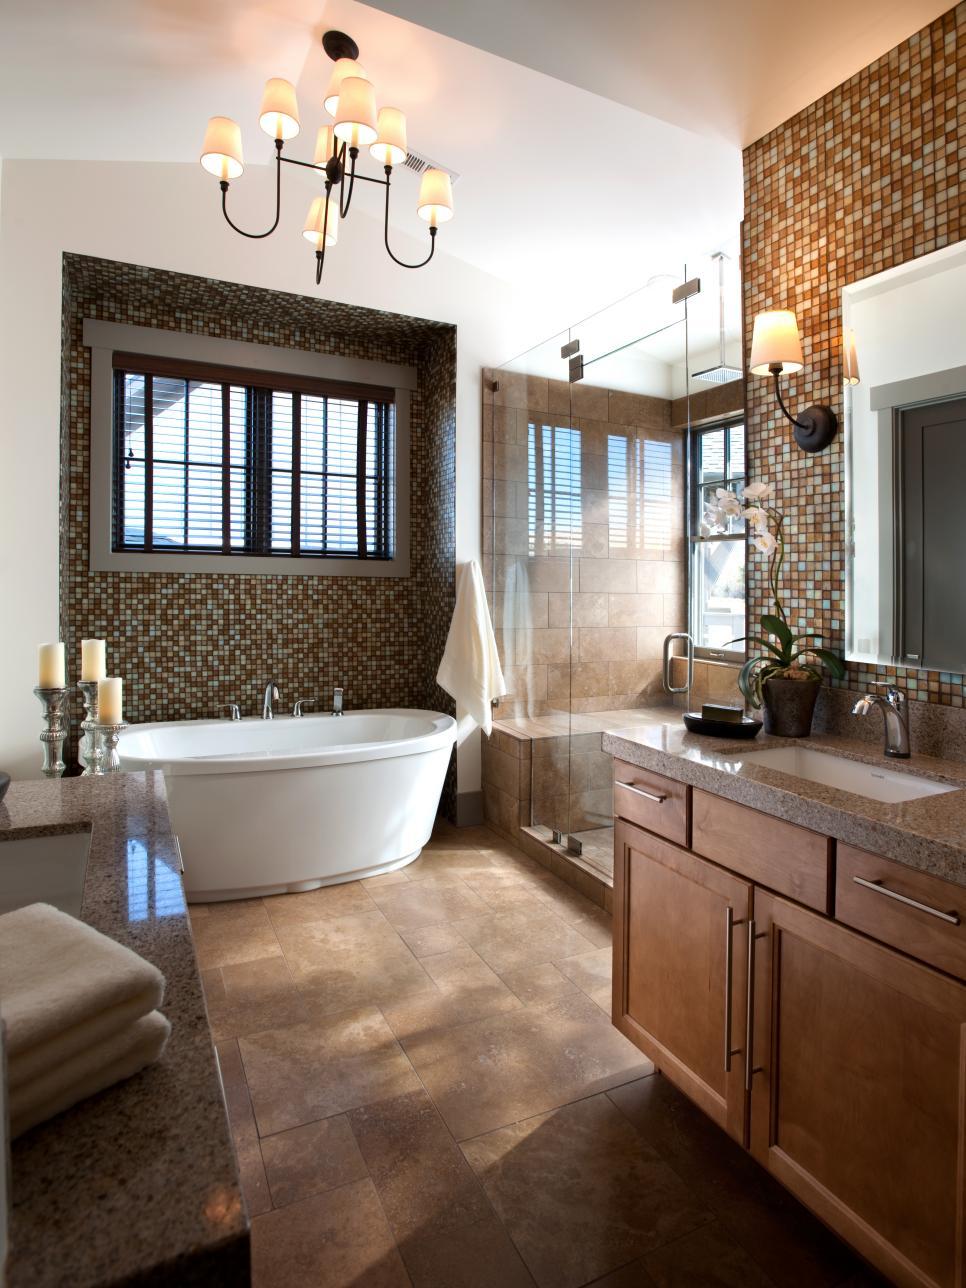 01-DH2012_Master-Bathroom_3x4.jpg.rend.hgtvcom.966.1288